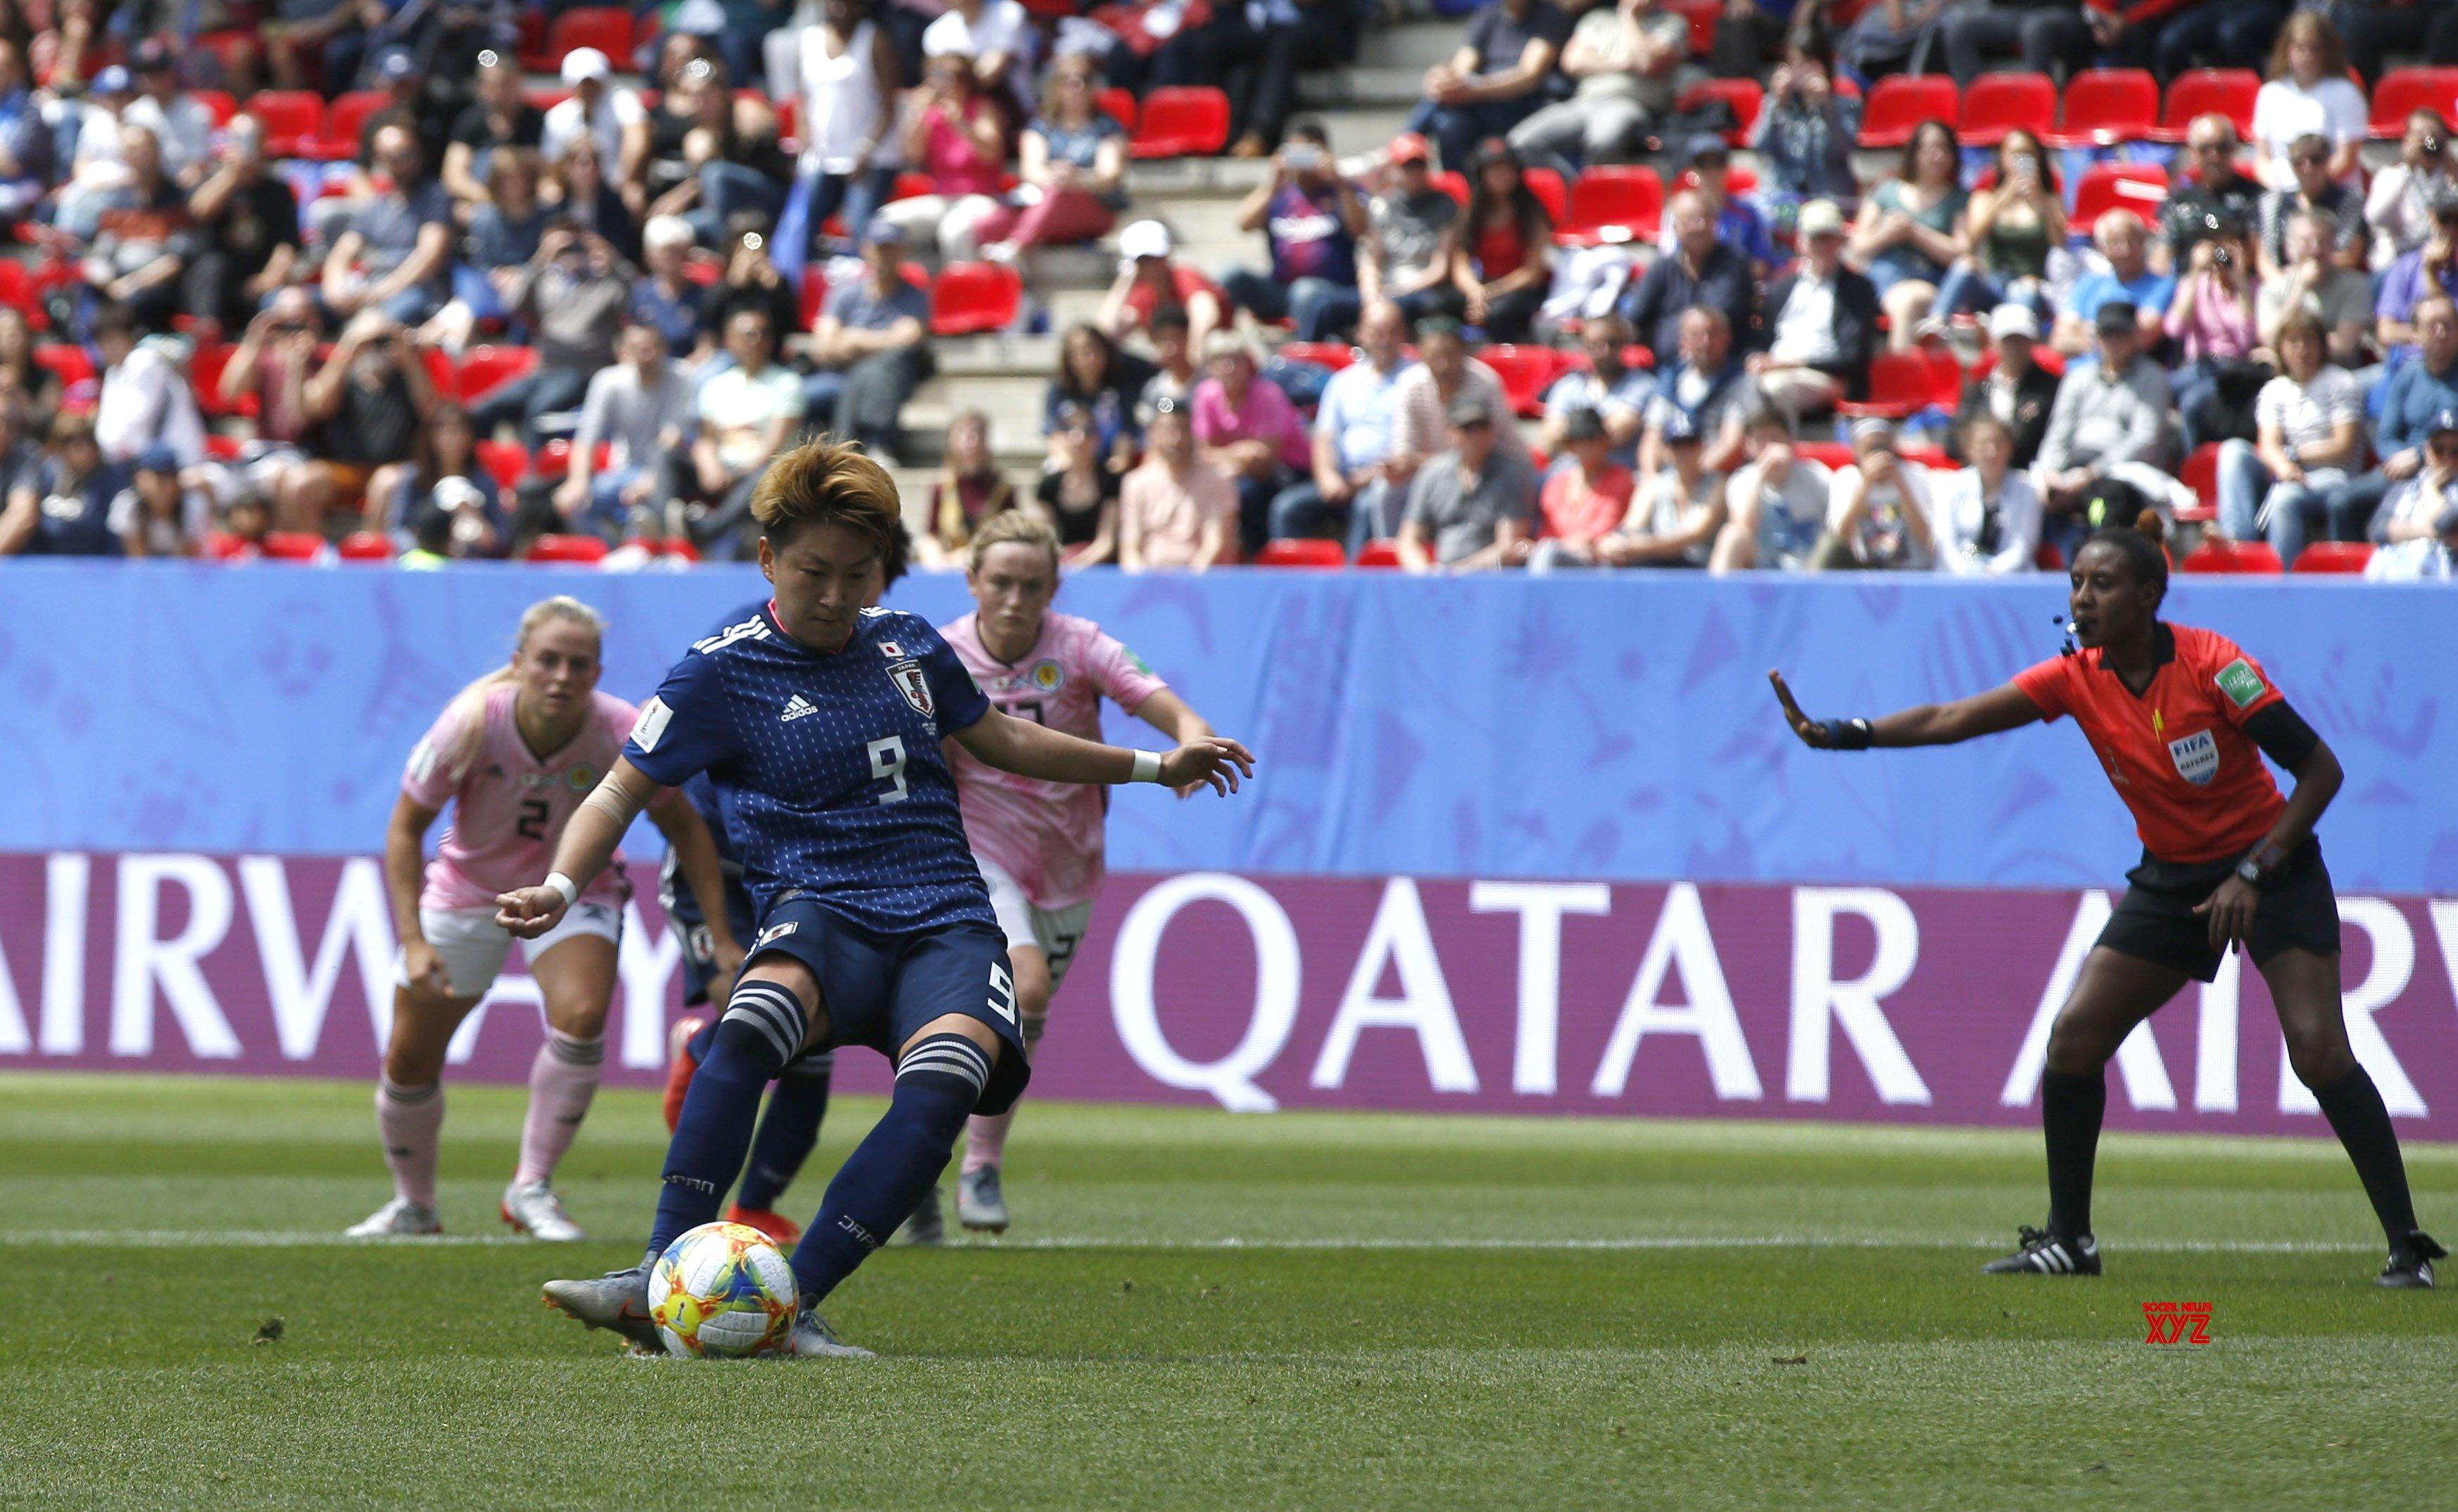 FRANCE - RENNES - 2019 FIFA WOMEN'S WORLD CUP - GROUP D - JPN VS SCO #Gallery